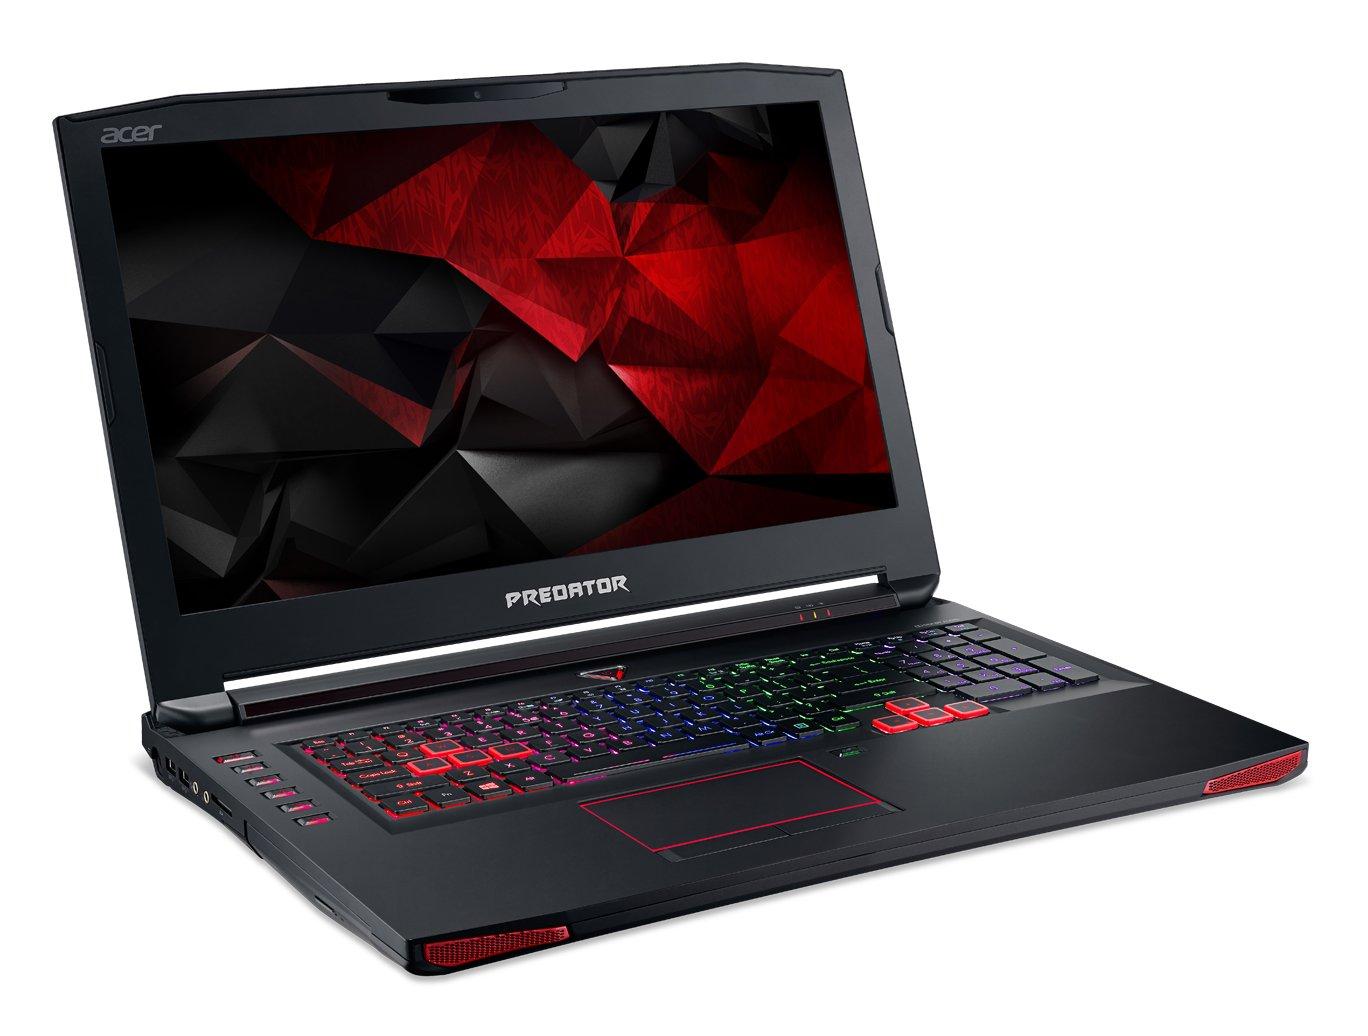 "Amazon.com: Acer Predator 17 Gaming Laptop, 17.3"" Full HD, Core i7, NVIDIA GTX980M, 32GB DDR4, 512GB SSD, 1TB HDD, Win 10, G9-792-70DR: Computers & ..."